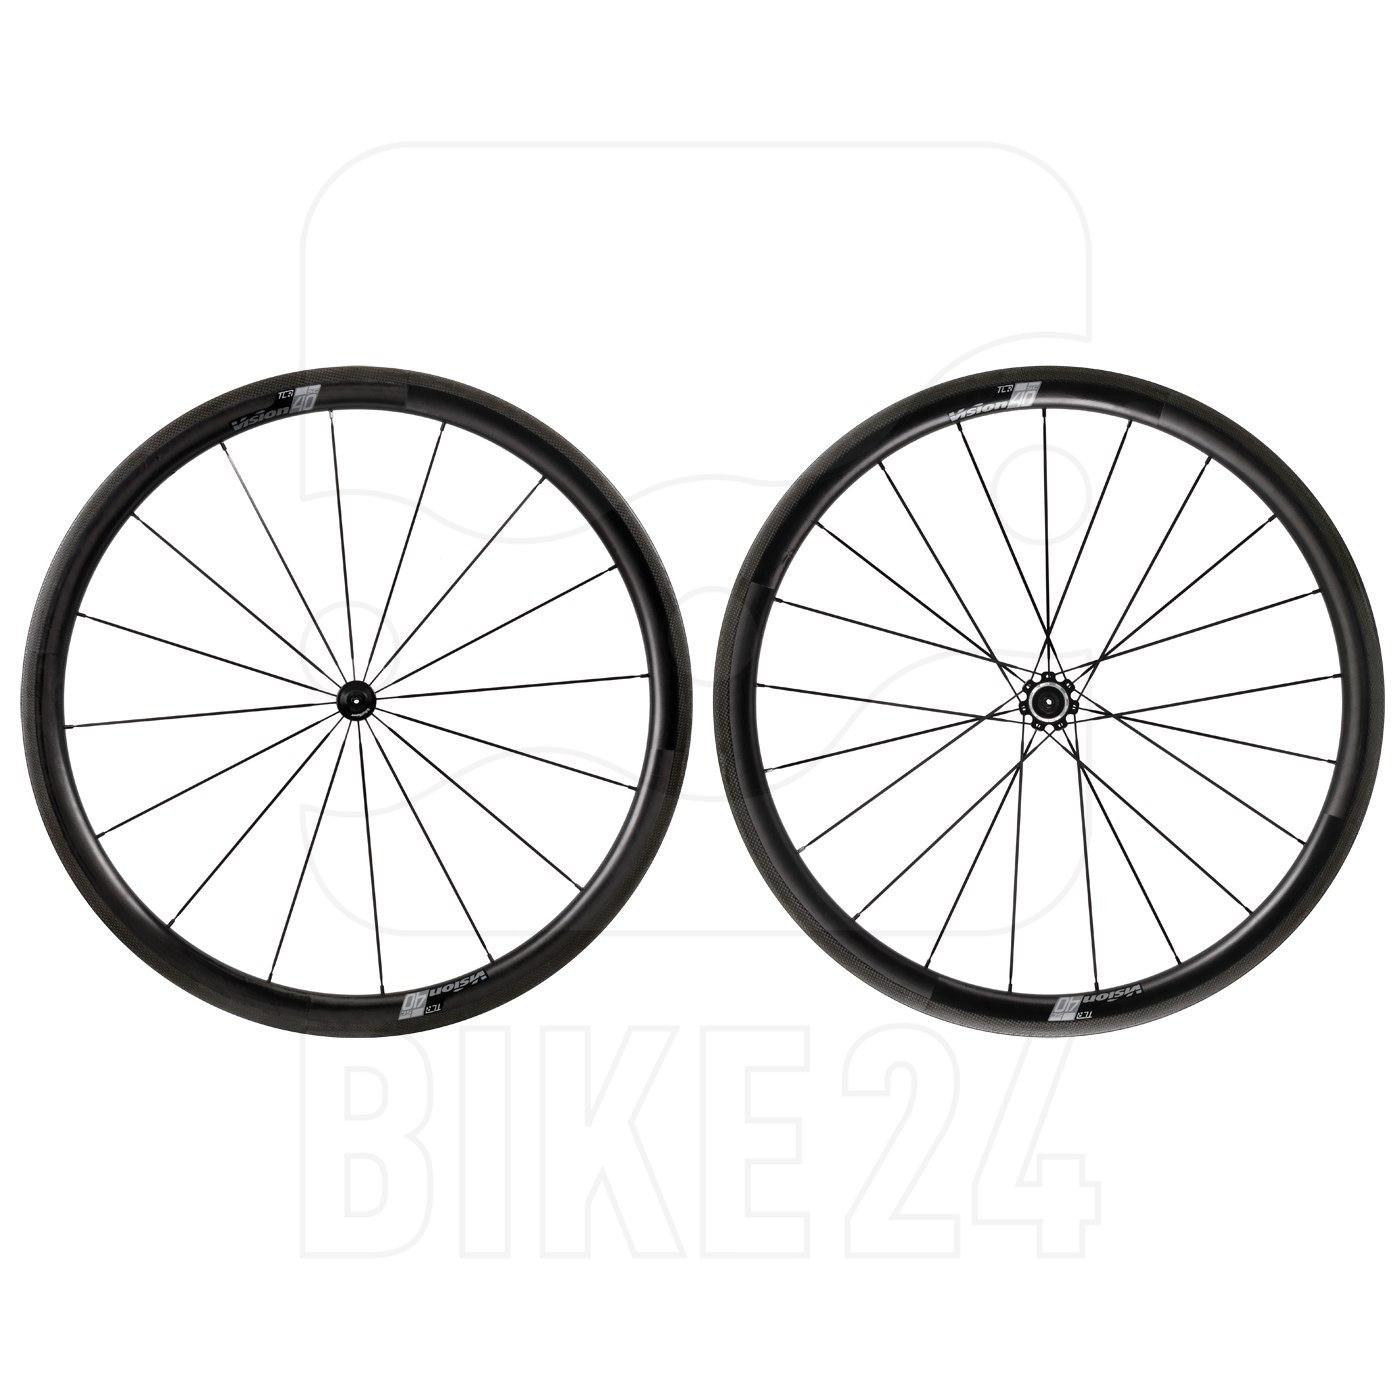 Vision SC 40 Carbon Laufradsatz - Tubeless Ready - Drahtreifen - QR